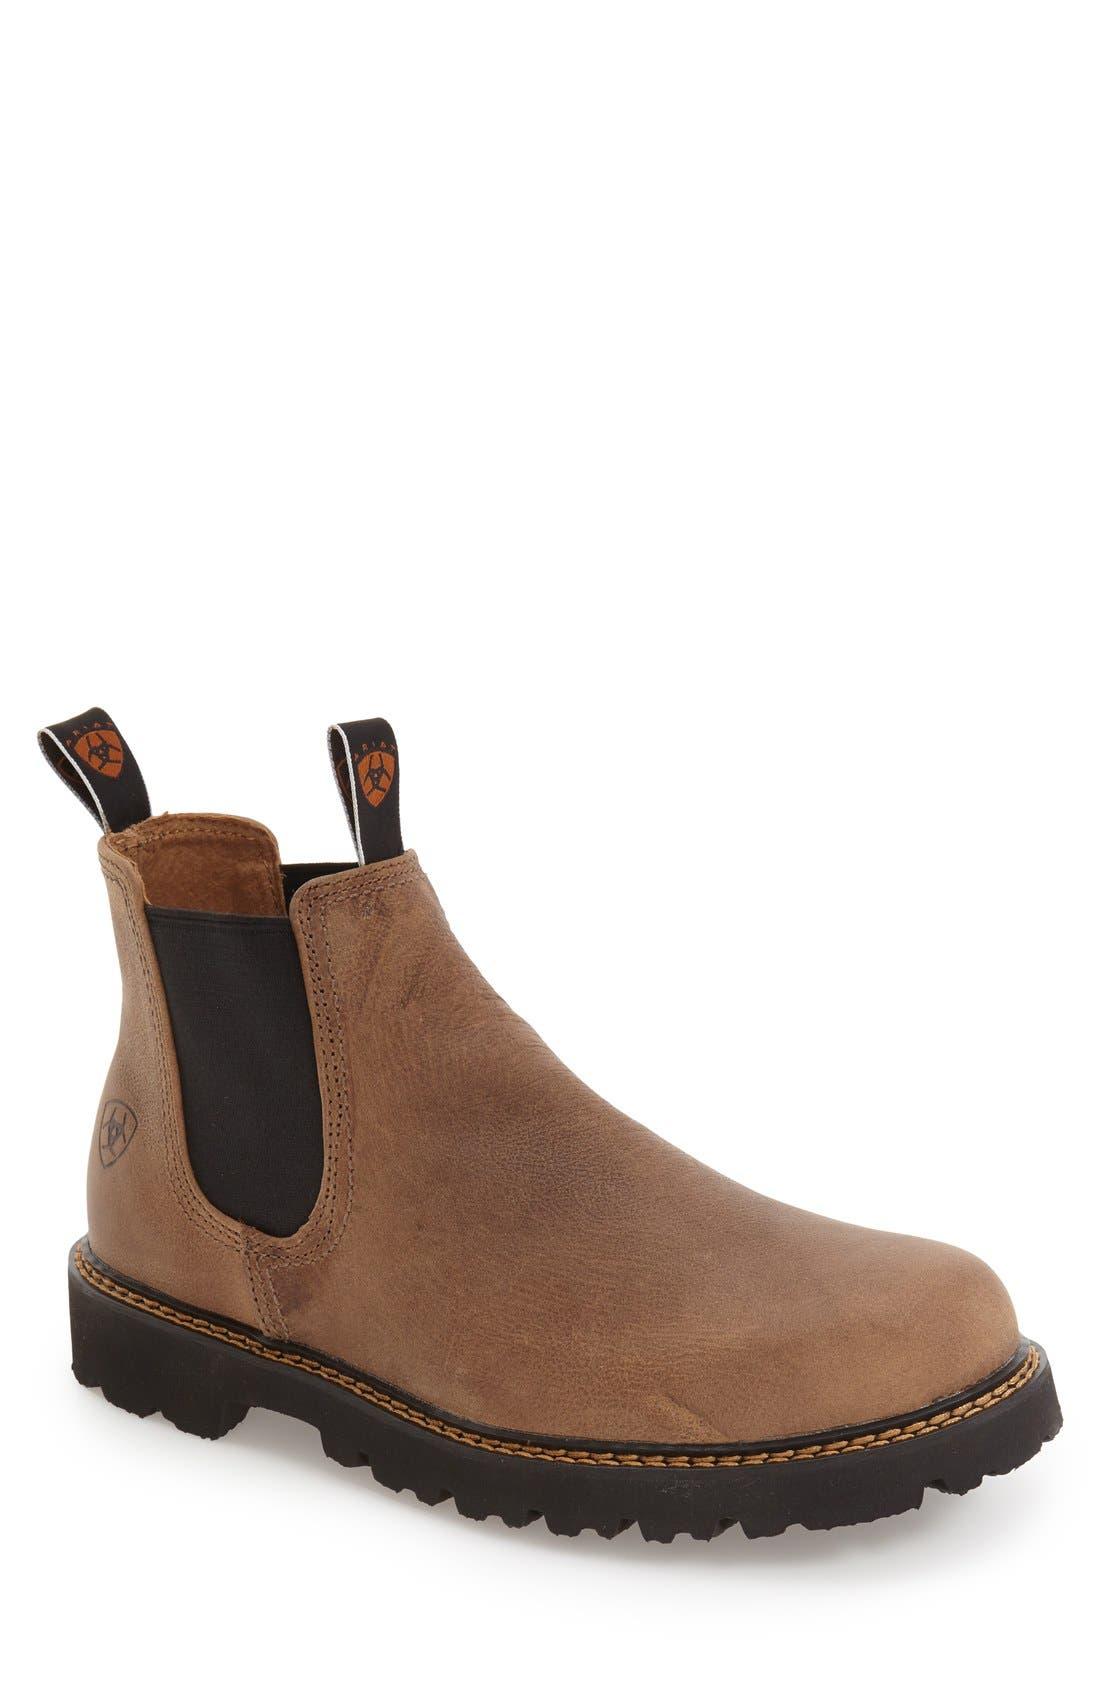 Alternate Image 1 Selected - Ariat 'Spot Hog' Chelsea Boot (Men)